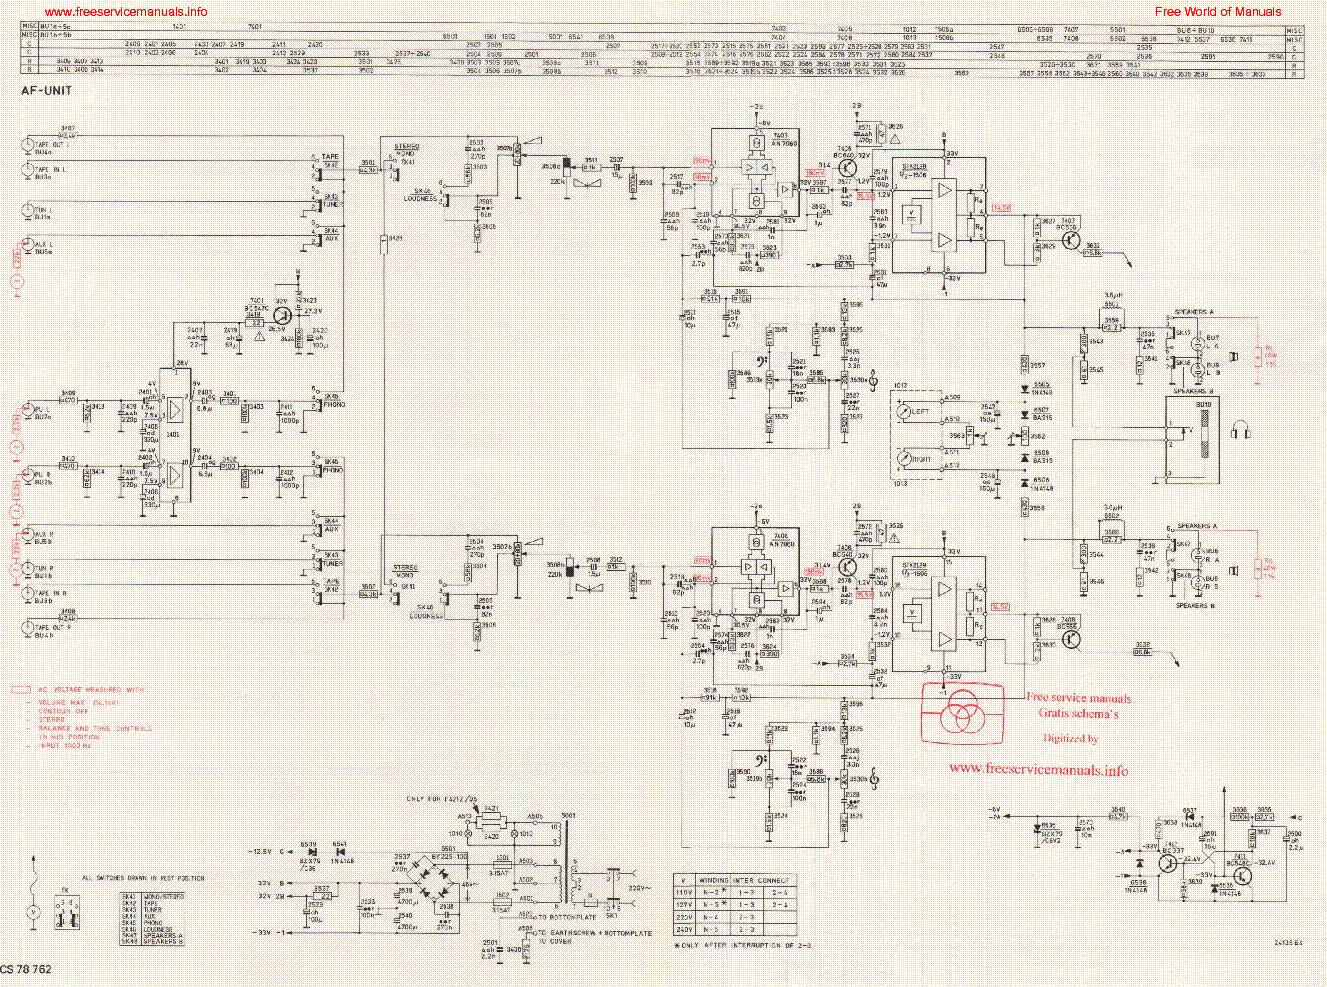 philips_f4212.pdf_2